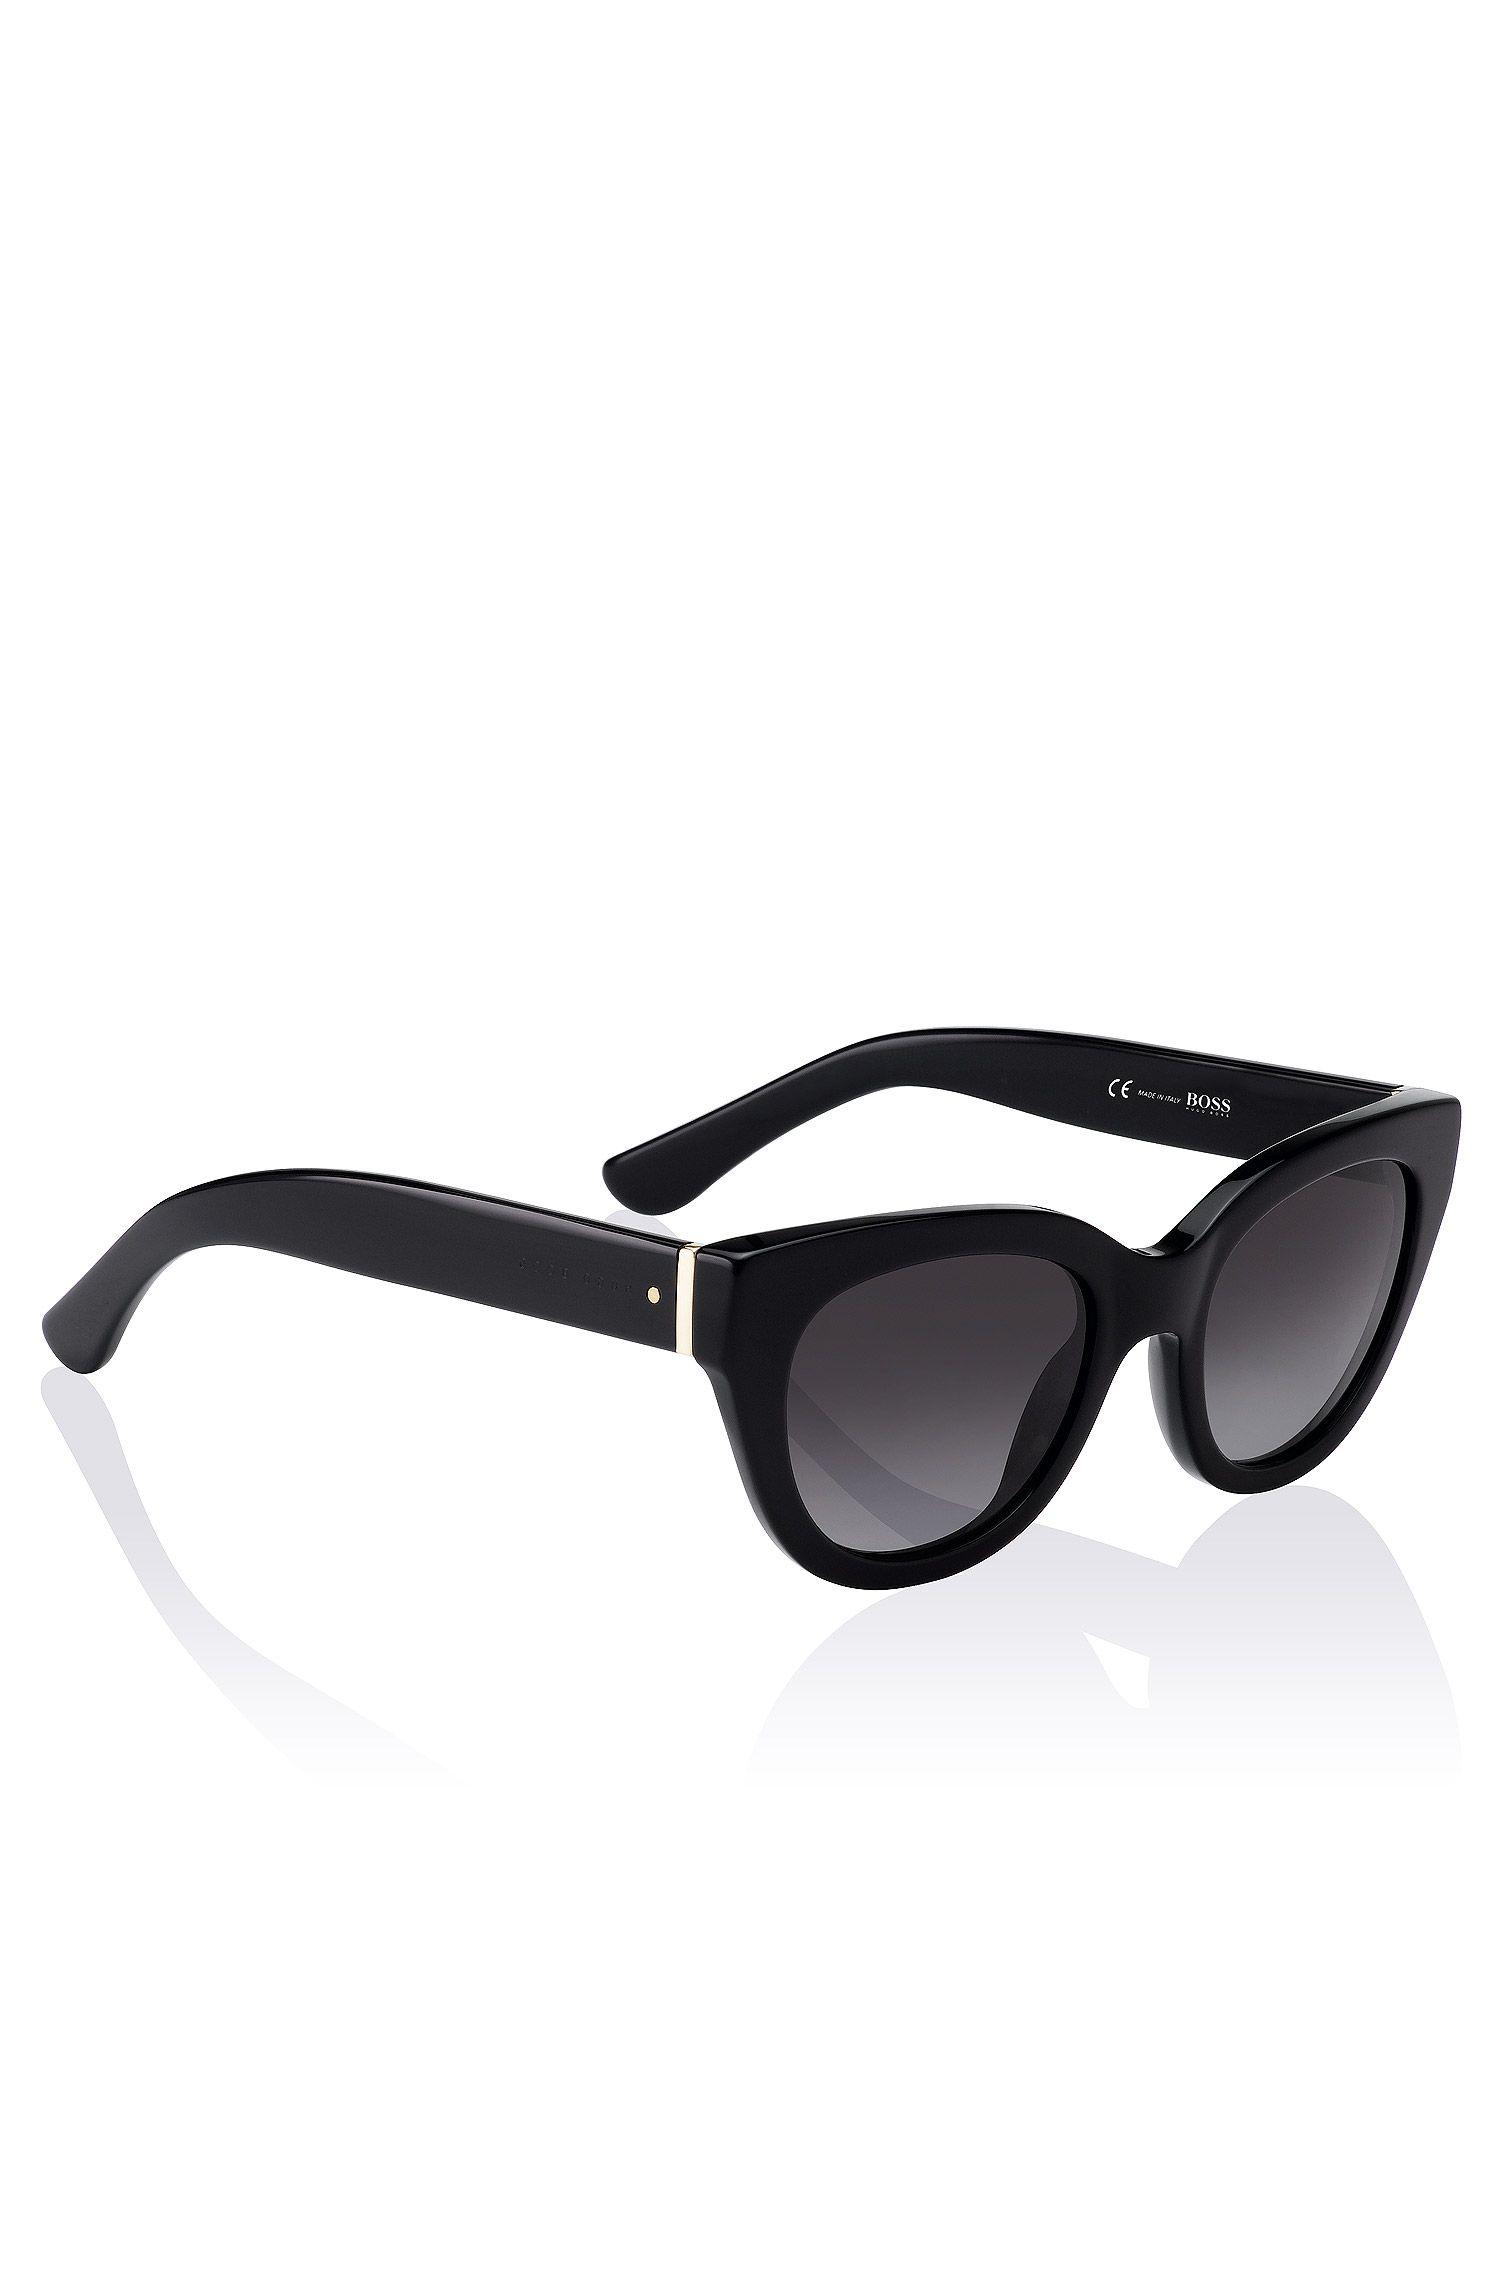 Gafas de sol estilo ojos de gato: 'BOSS 0715/S'